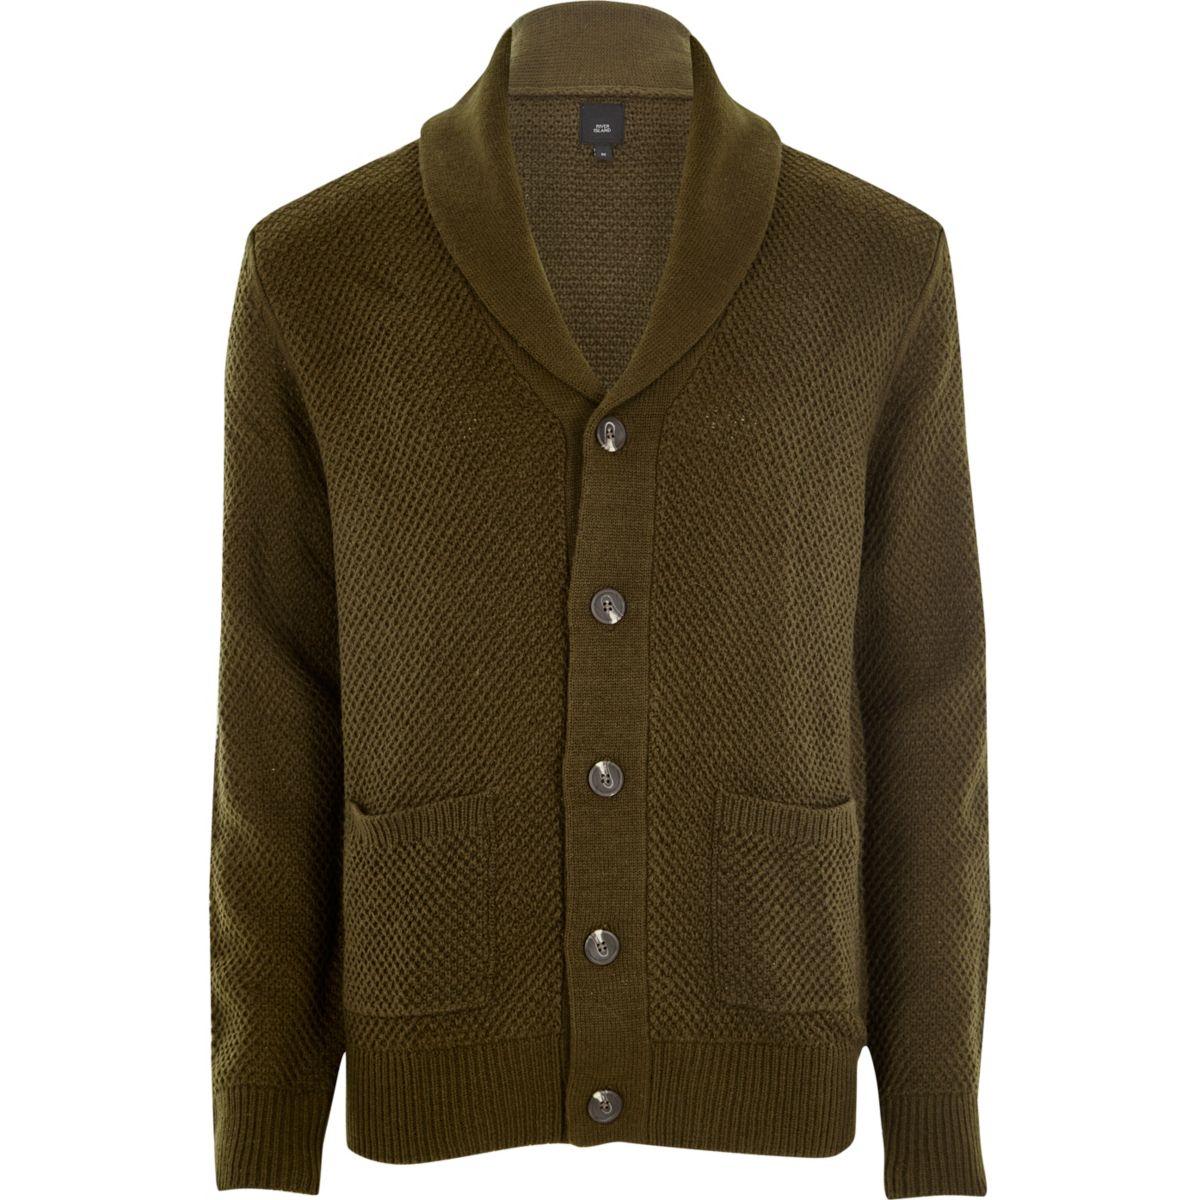 Khaki green shawl neck button-up cardigan